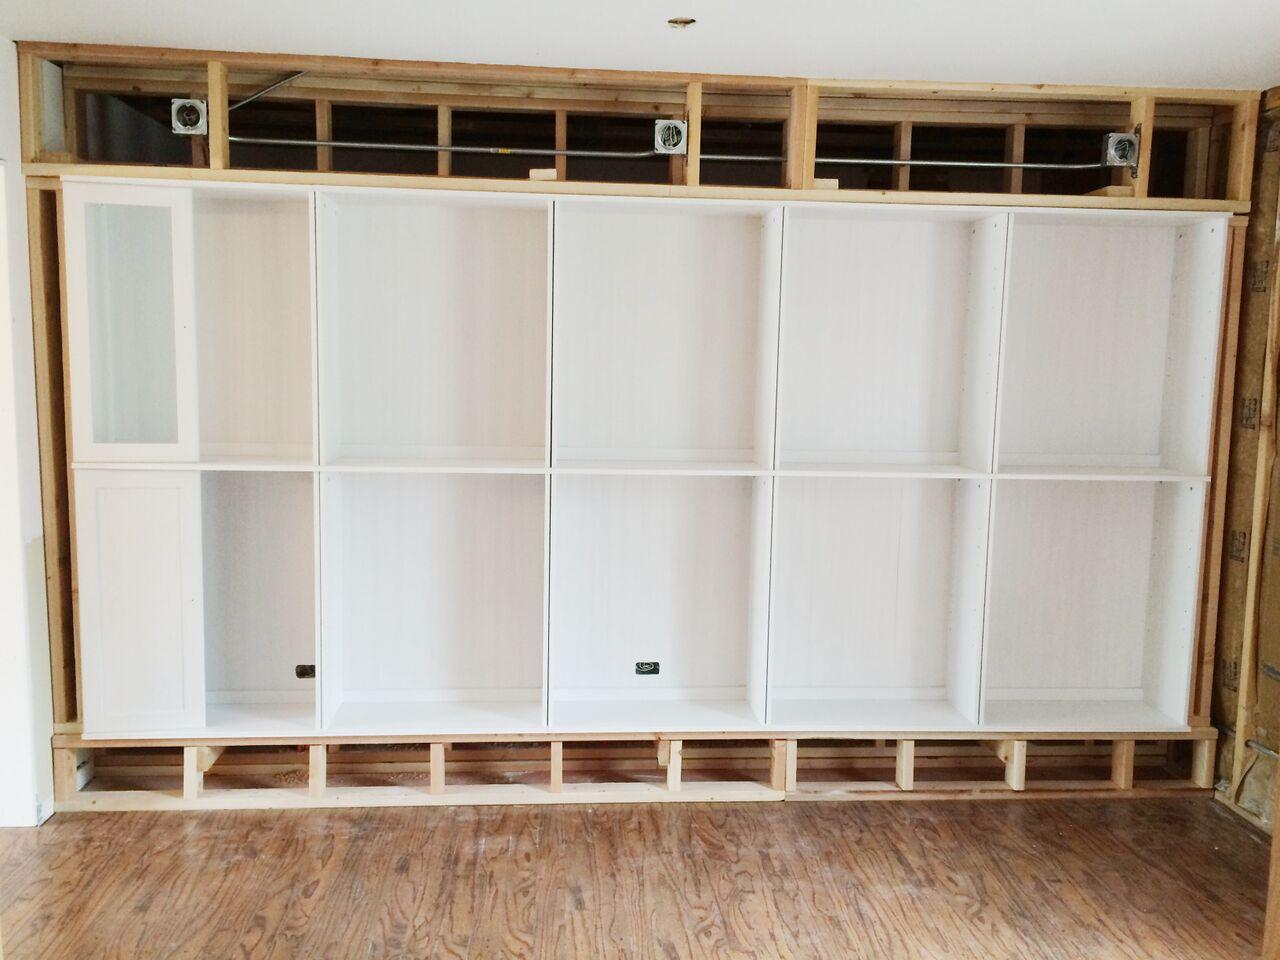 Avery street design blog diy summer school ikea hack for Built in nook shelves